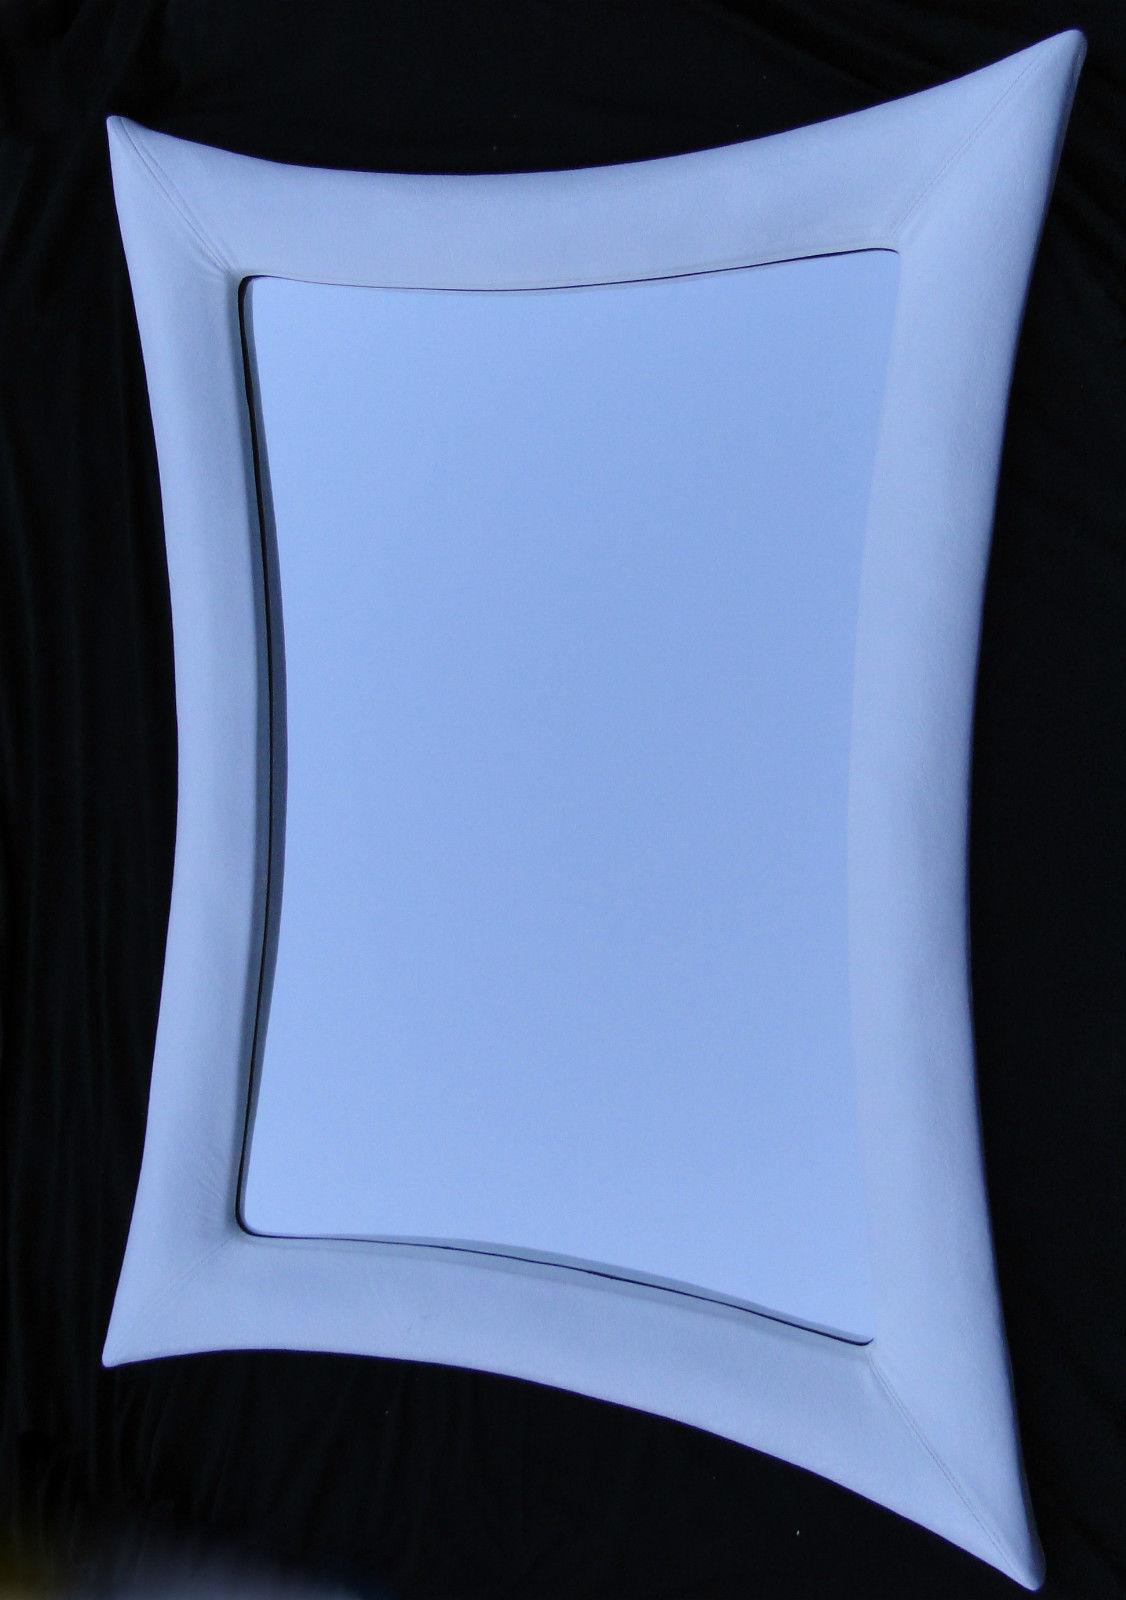 Wandspiegel wei full size of badezimmer otto versand - Otto wandspiegel ...